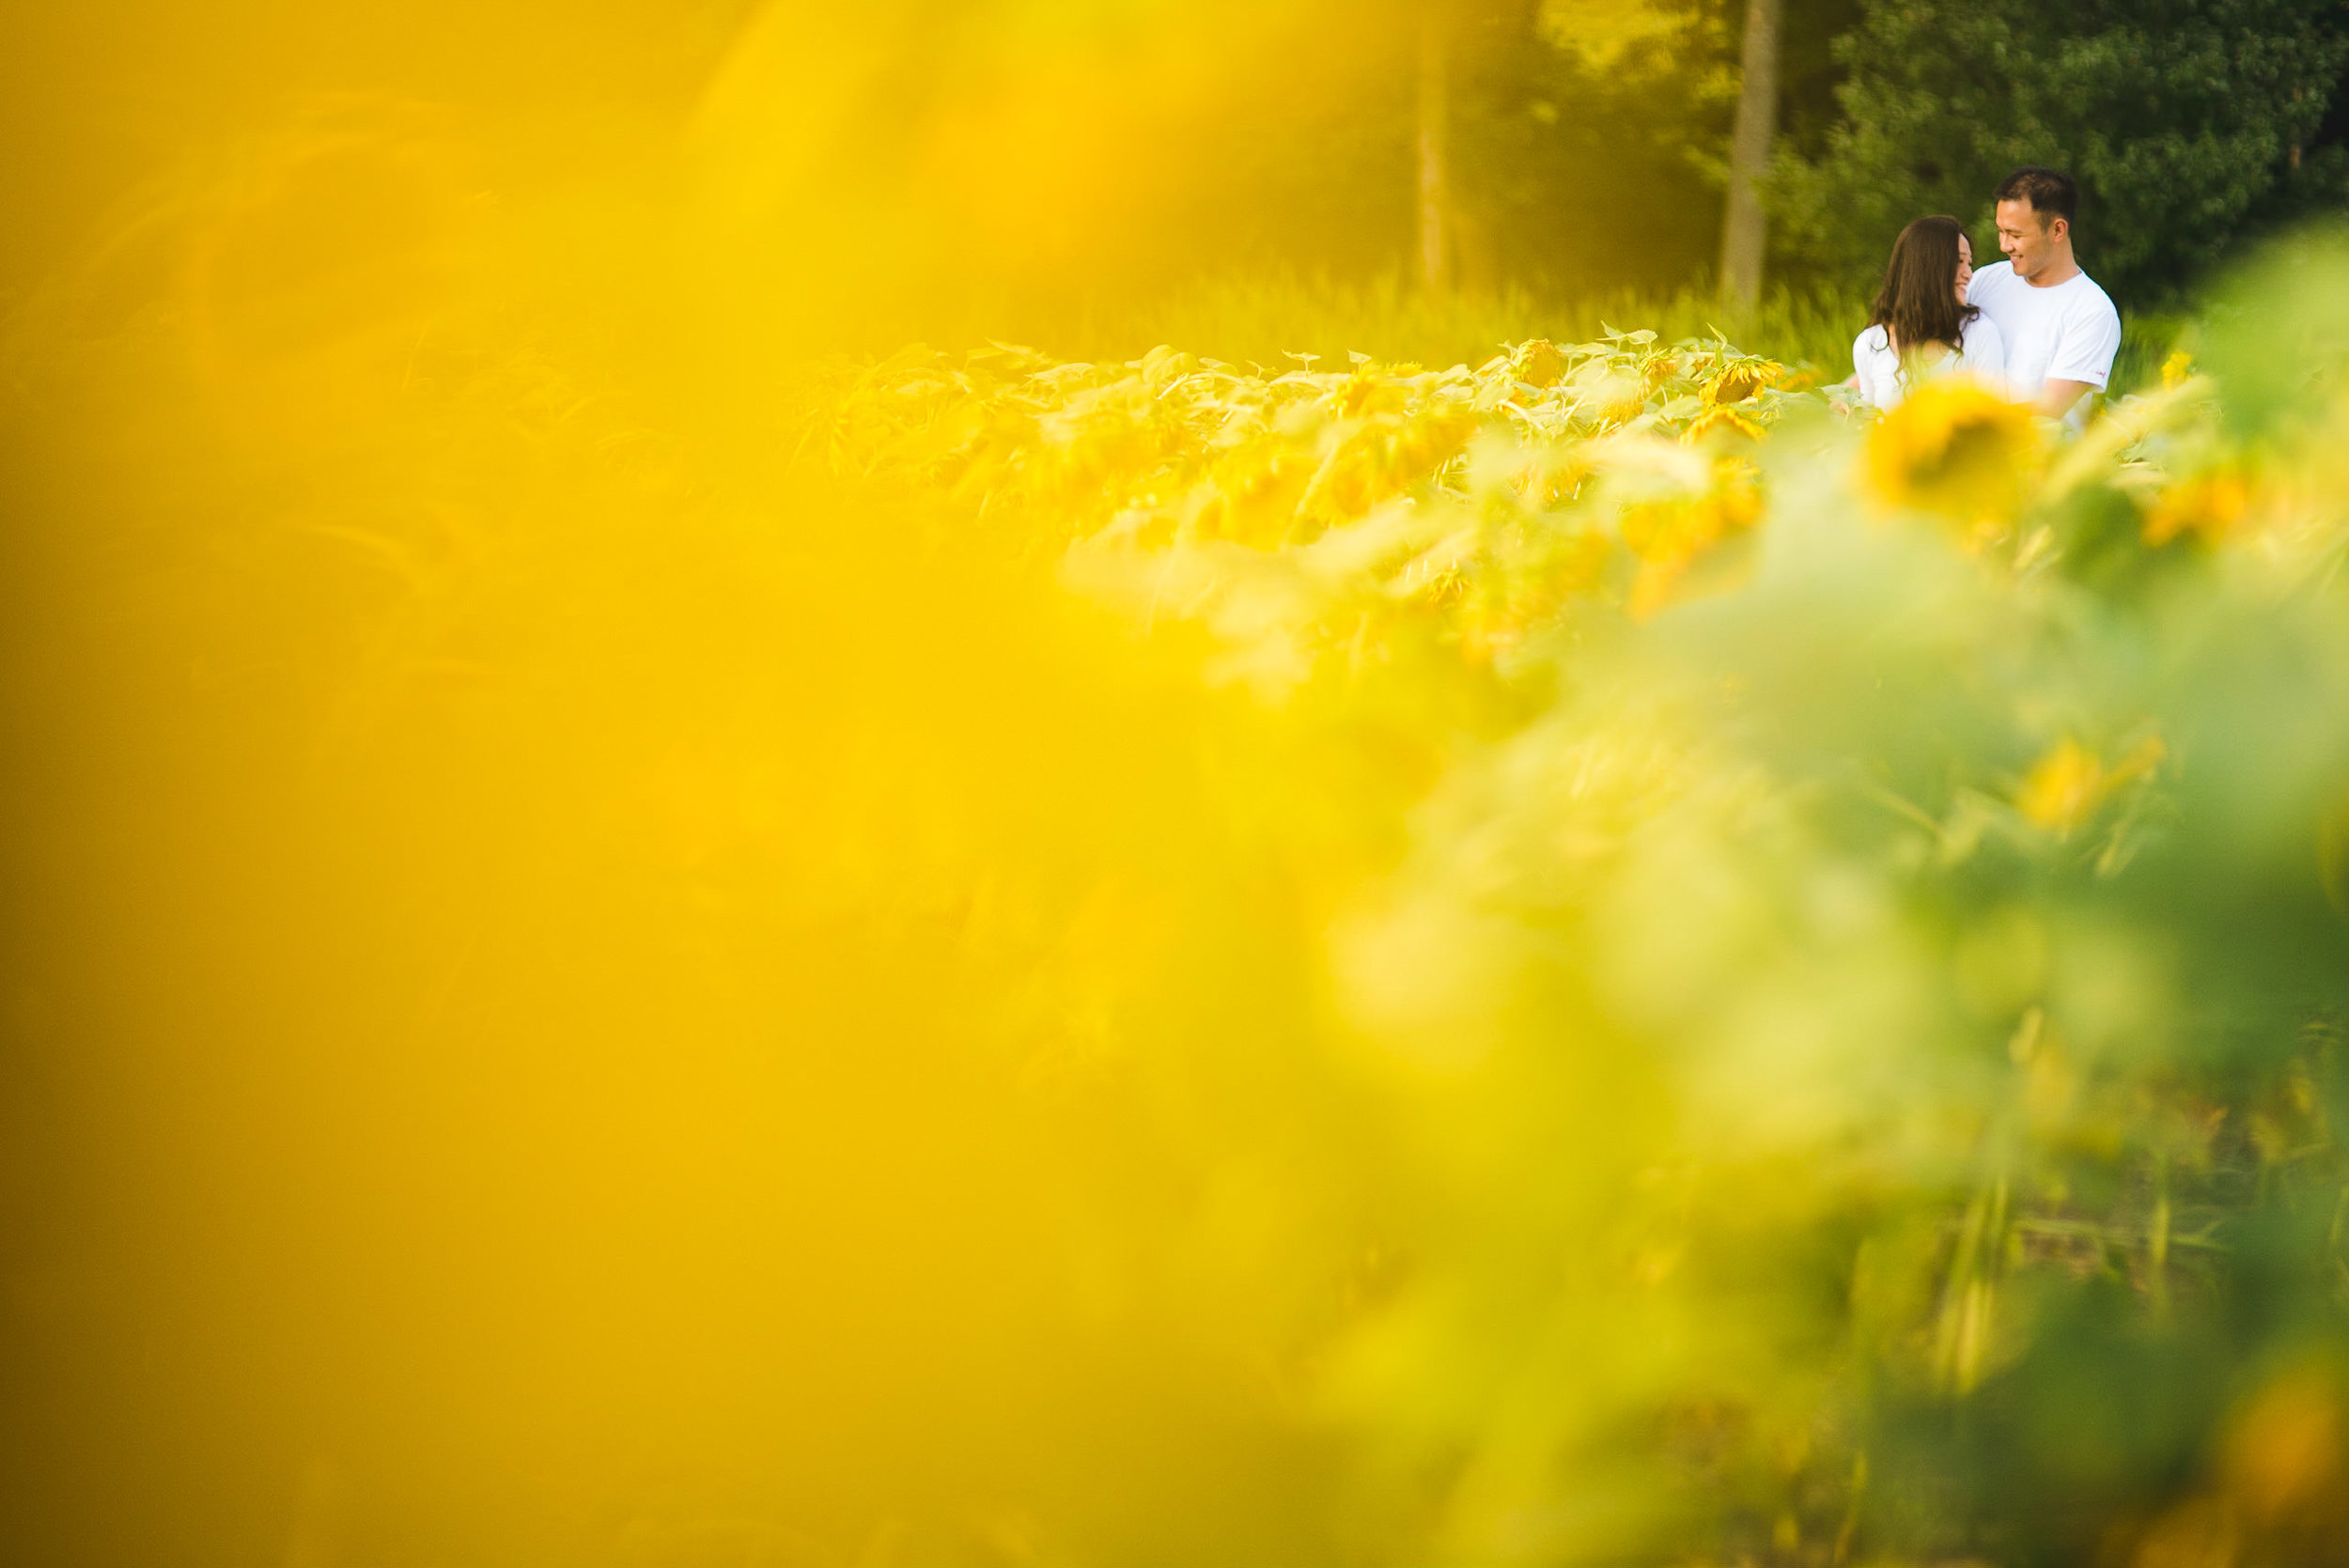 Sunflower Field Maryland Engagement Photographer Mantas Kubilinskas-2.jpg